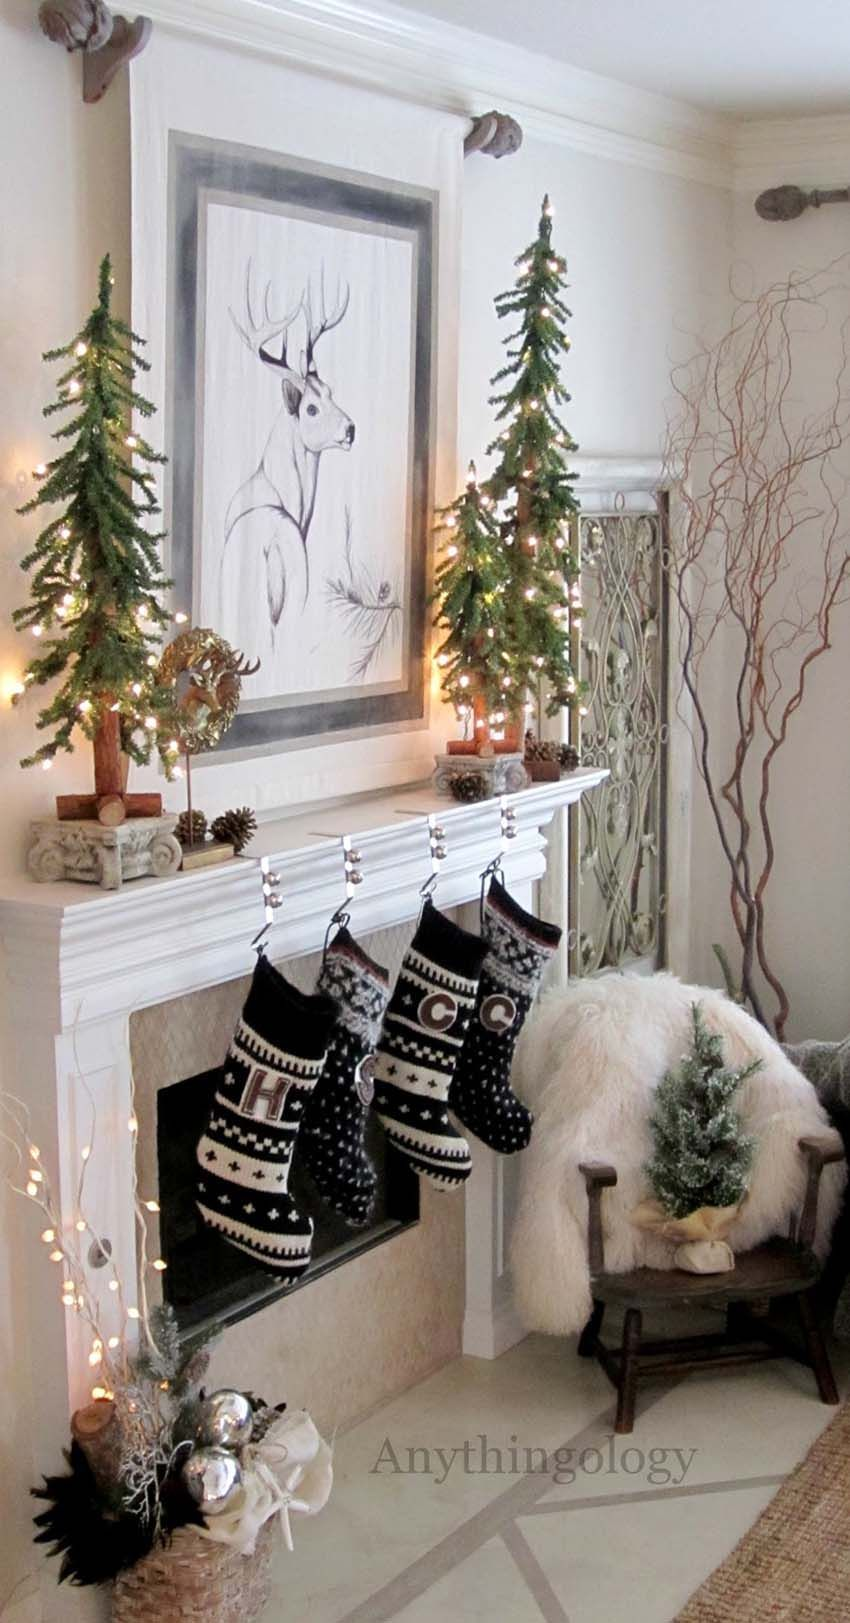 50 Absolutely Fabulous Christmas Mantel Decorating Ideas Absolutely Christmas In 2020 Weihnachten Kamindekorationen Weihnachtlicher Kamin Weihnachtlich Dekorieren